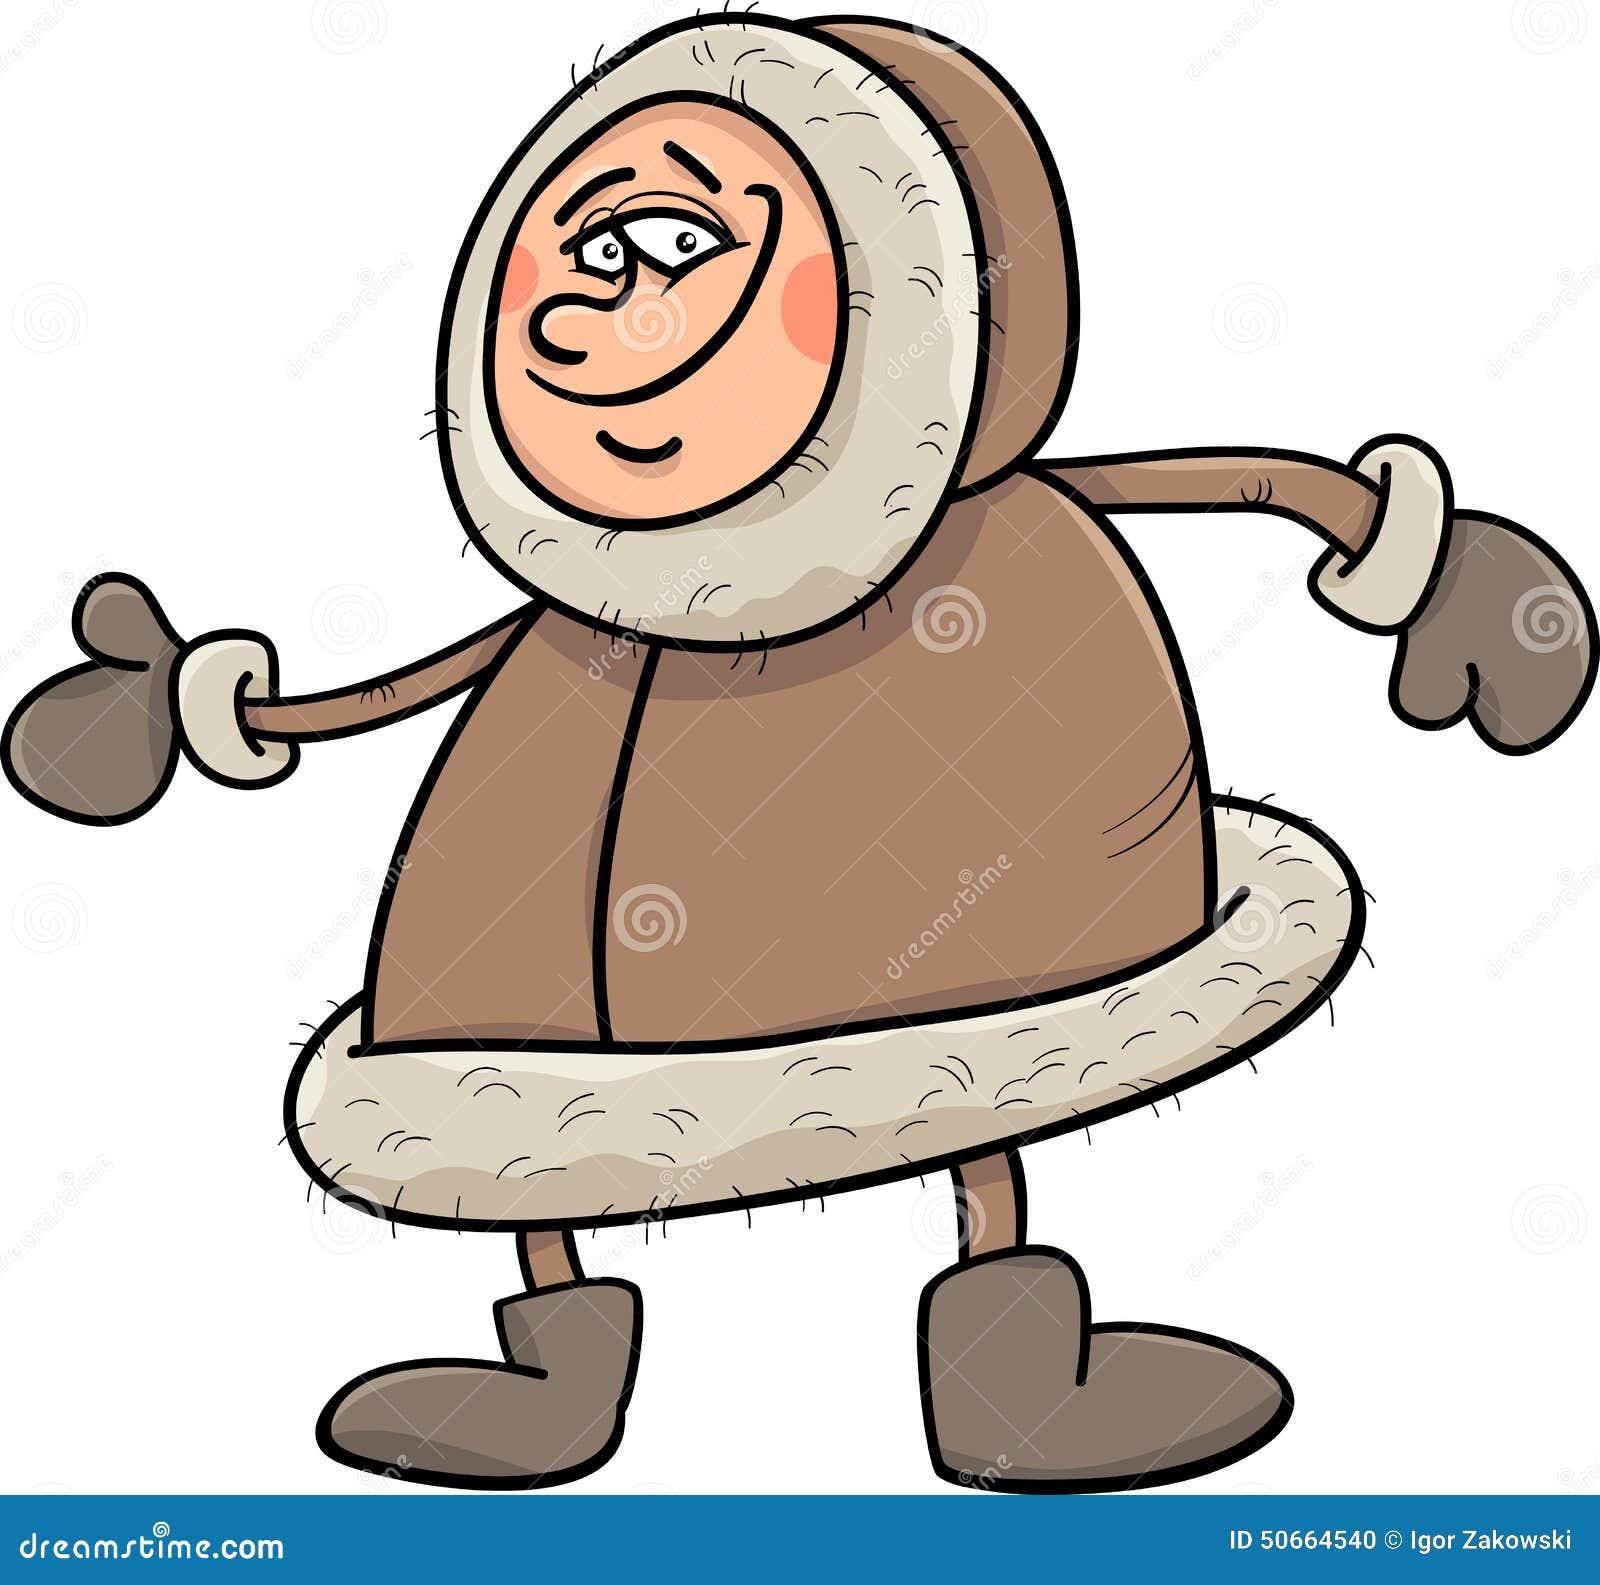 Eskimo Cartoon Illustration Stock Vector - Image: 50664540